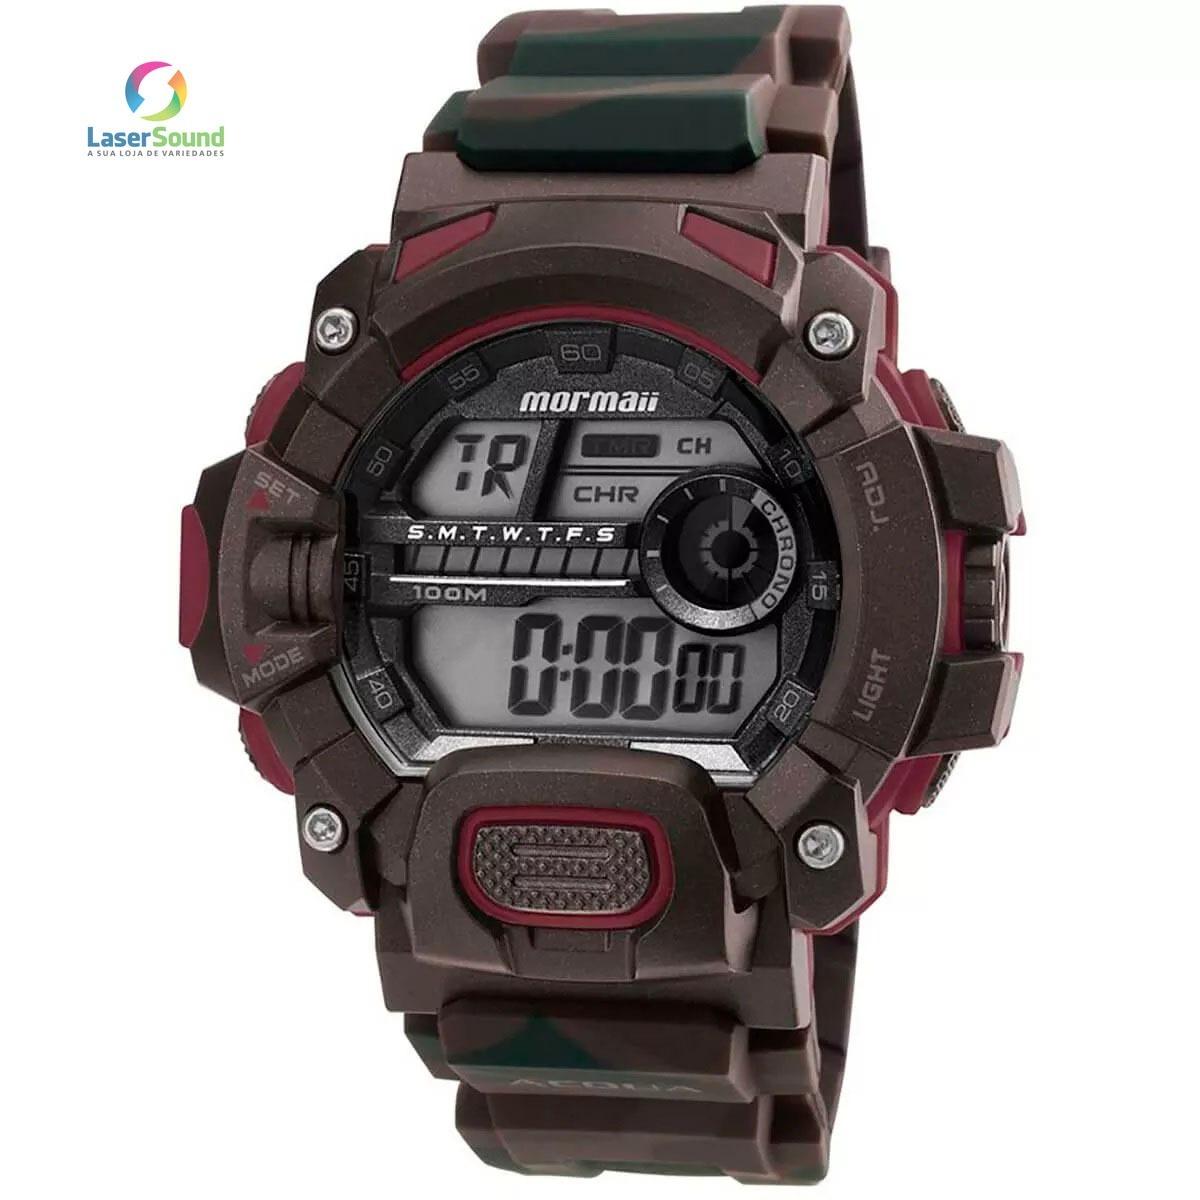 Relógio Mormaii Masculino Mo1132af 8m, C  Garantia E Nf - R  199,00 ... 5b8a06a8bc